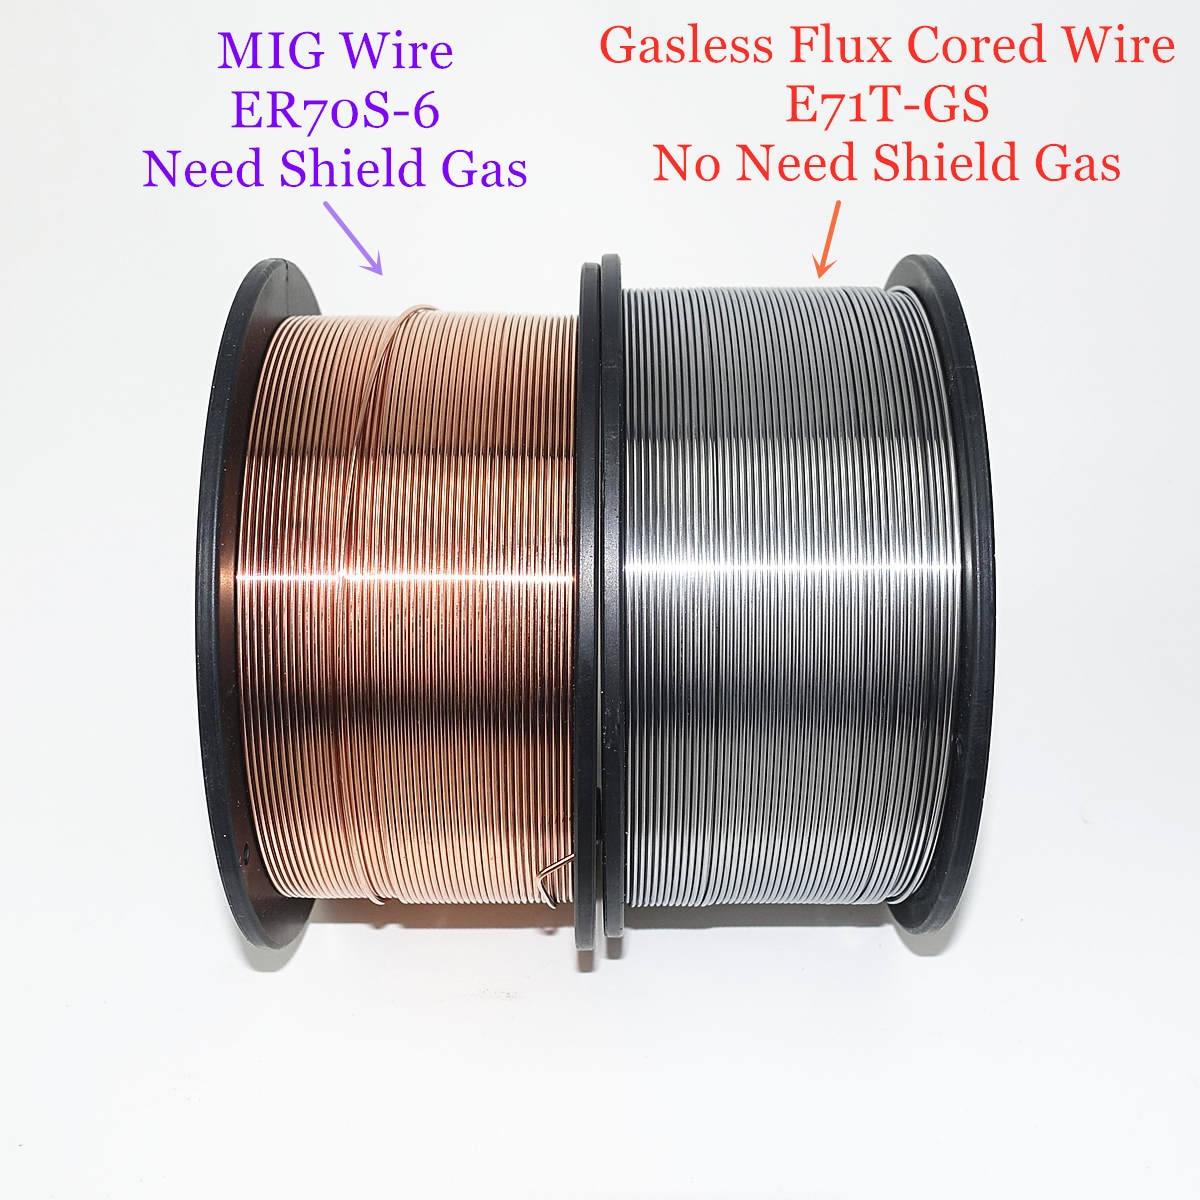 0 Shield Gas Flux 0 ER70S 8 Wire 6 E71T Gas MIG Cored 0 GS 6 Welding Material Welding No Wire 5kg Gasless Steel 9mm